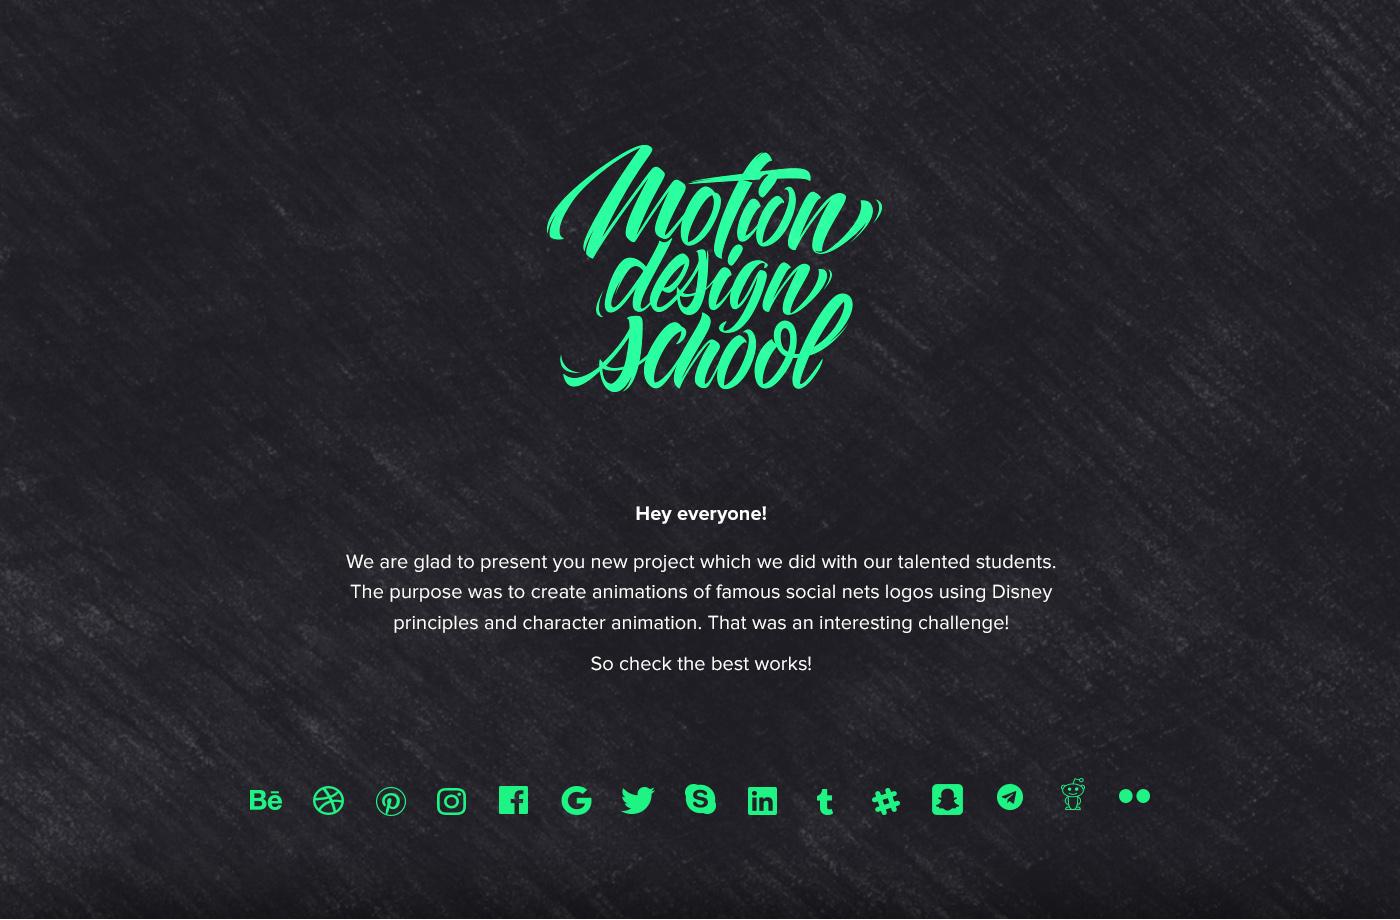 logo,animation ,intro,motion design,motion design school,free,Character,logofolio,logoset,motion